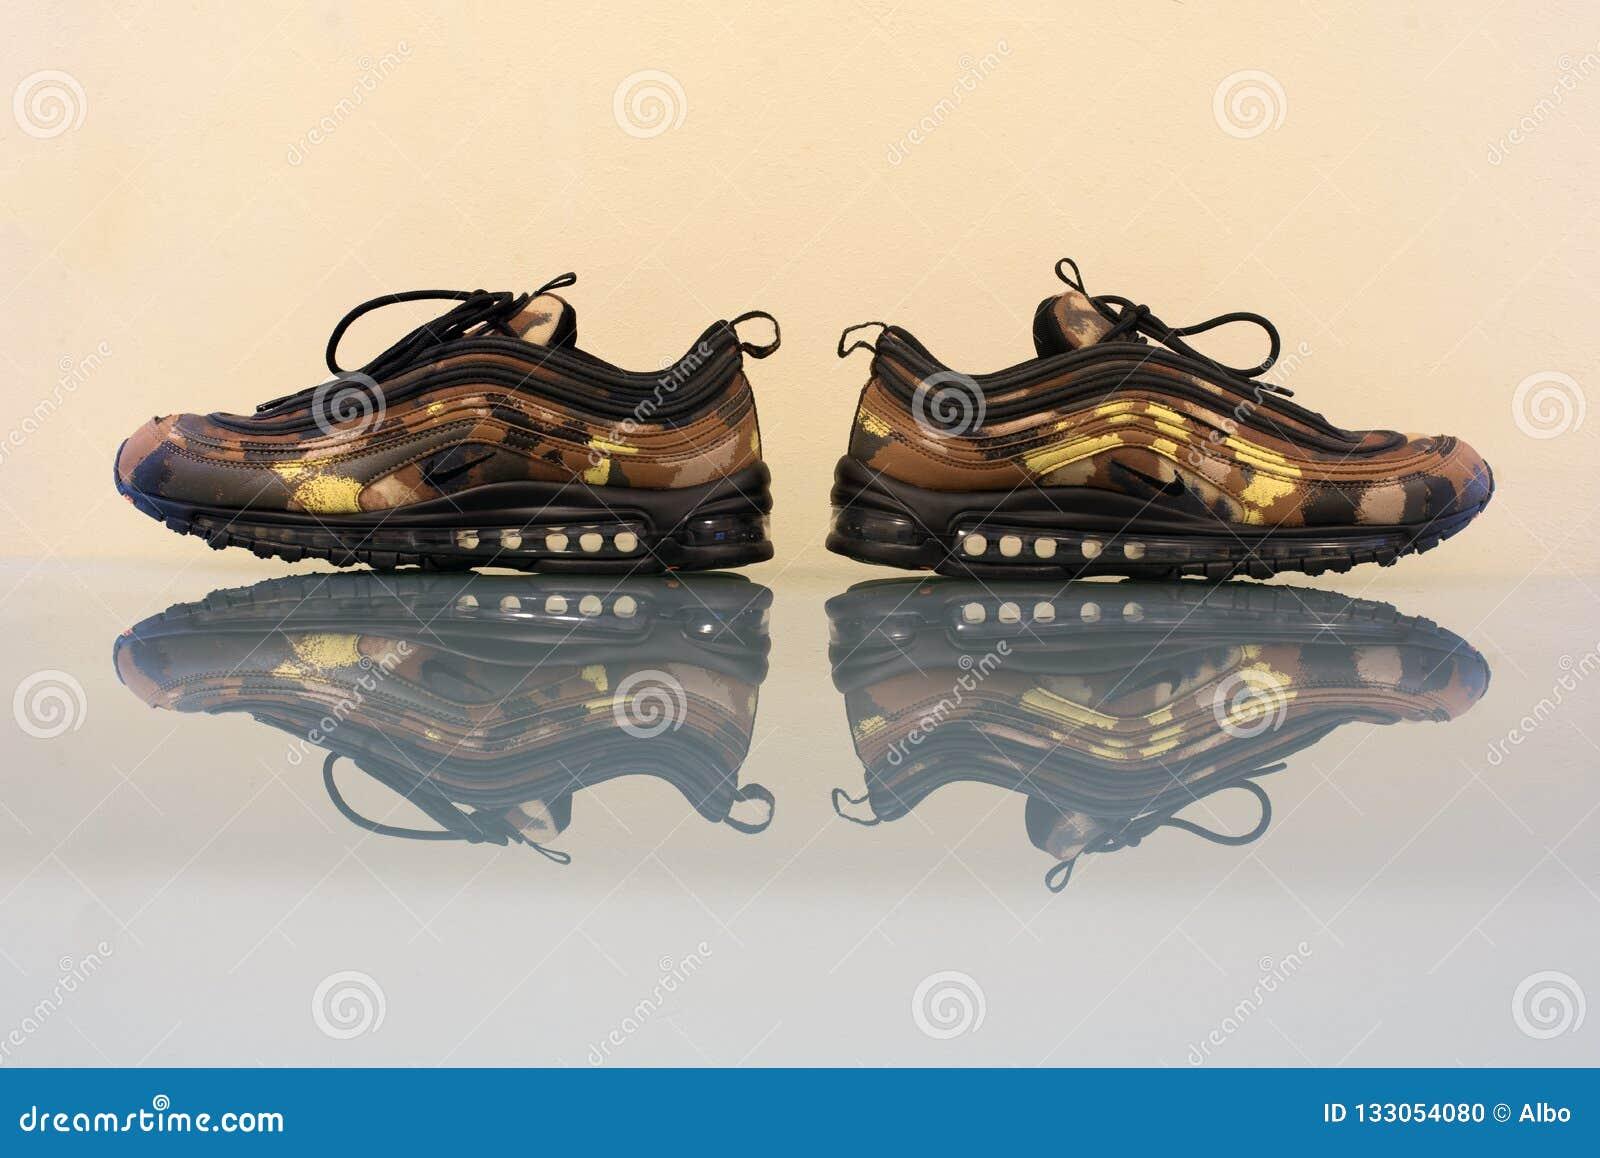 Nike Air Max 97 Premium Camo Pack Italy Editorial Image